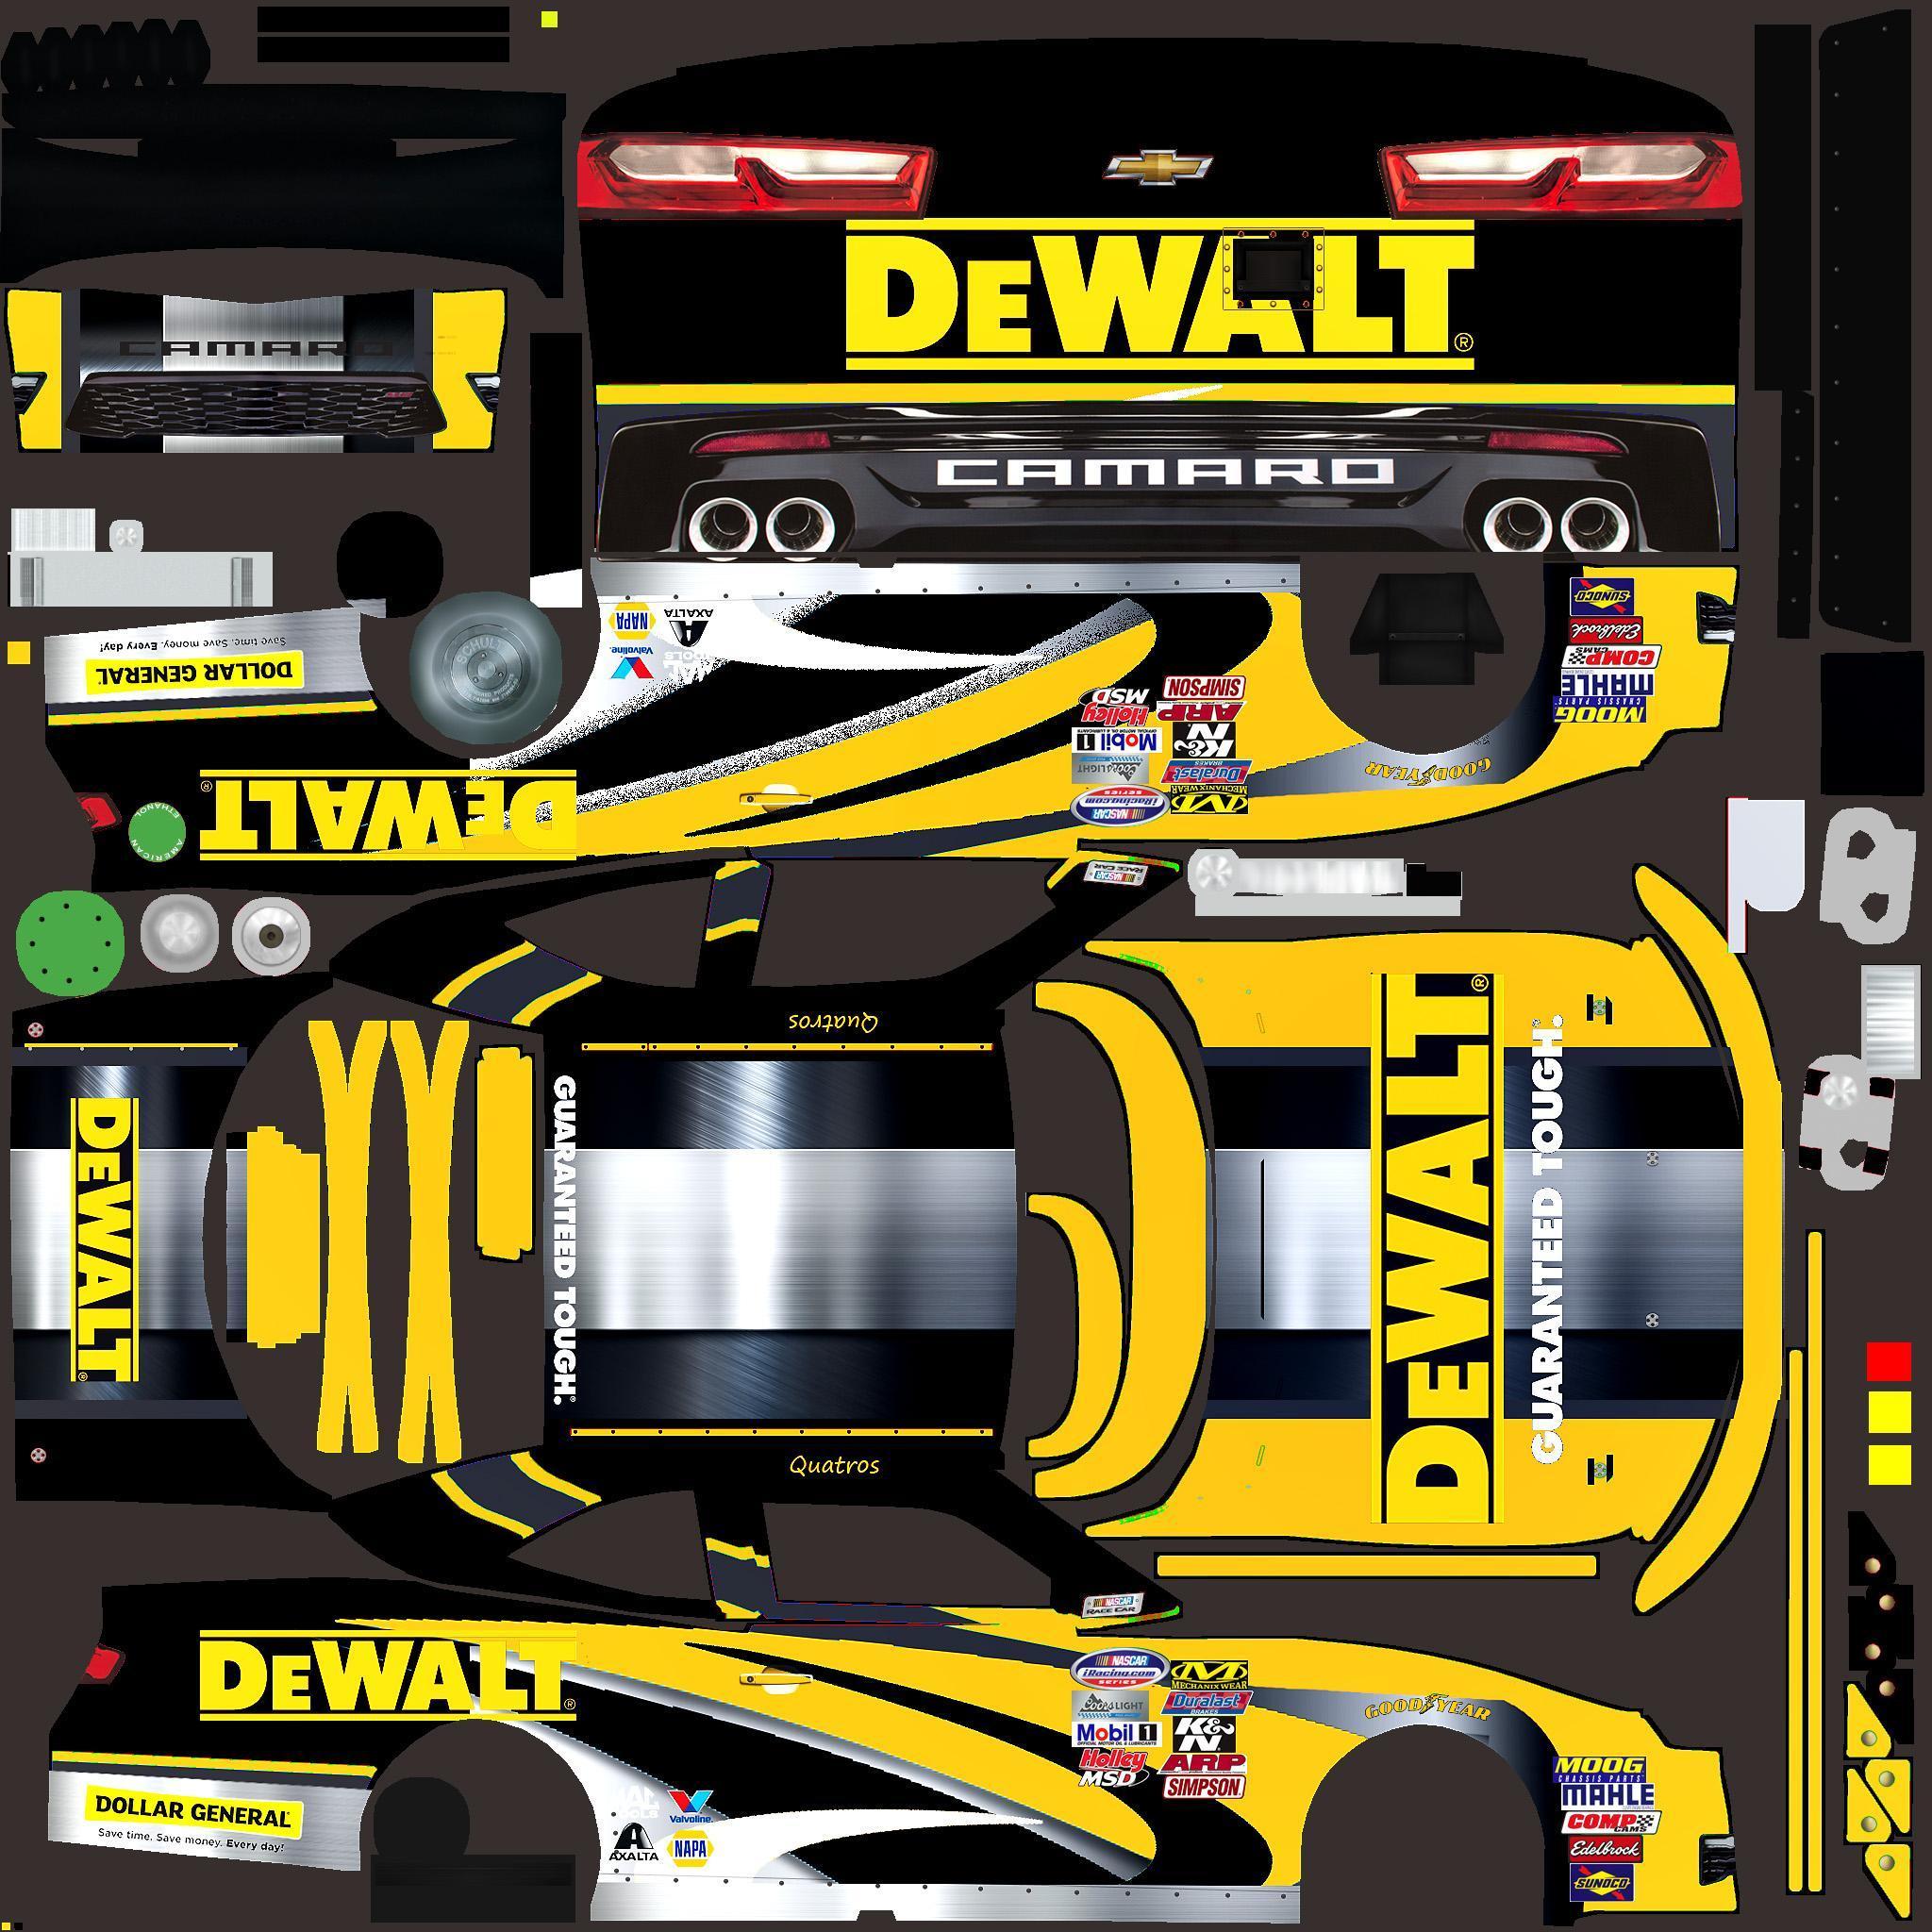 Dewalt Chevy Camaro Custom Paint Scheme by Jose M  - Trading